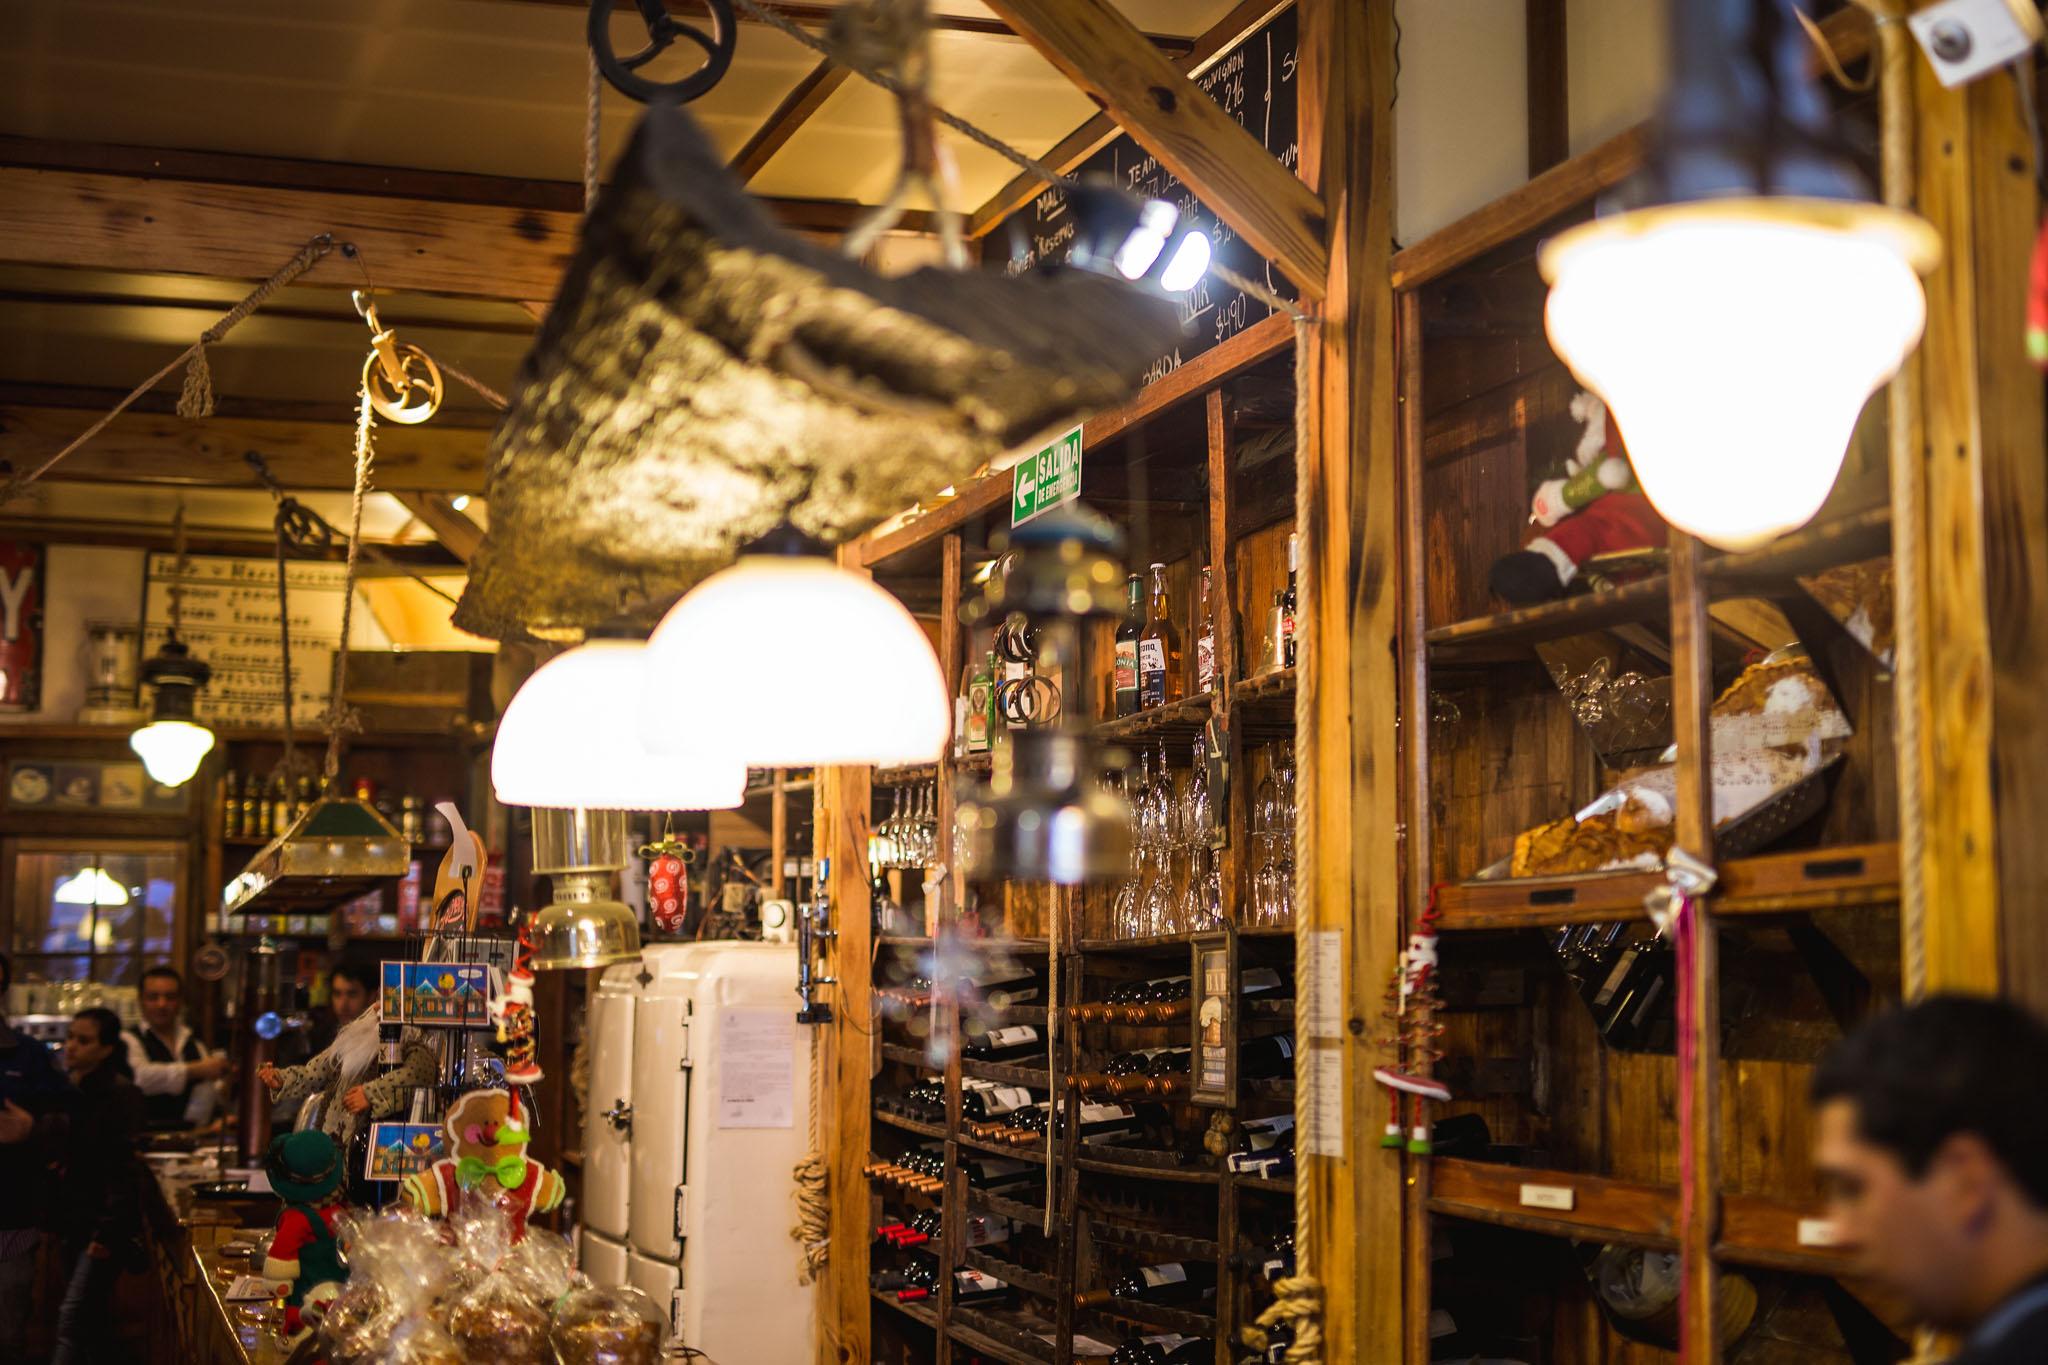 wedding-travellers-tierra-del-fuego-ushuaia-argentina-old-bar-decor